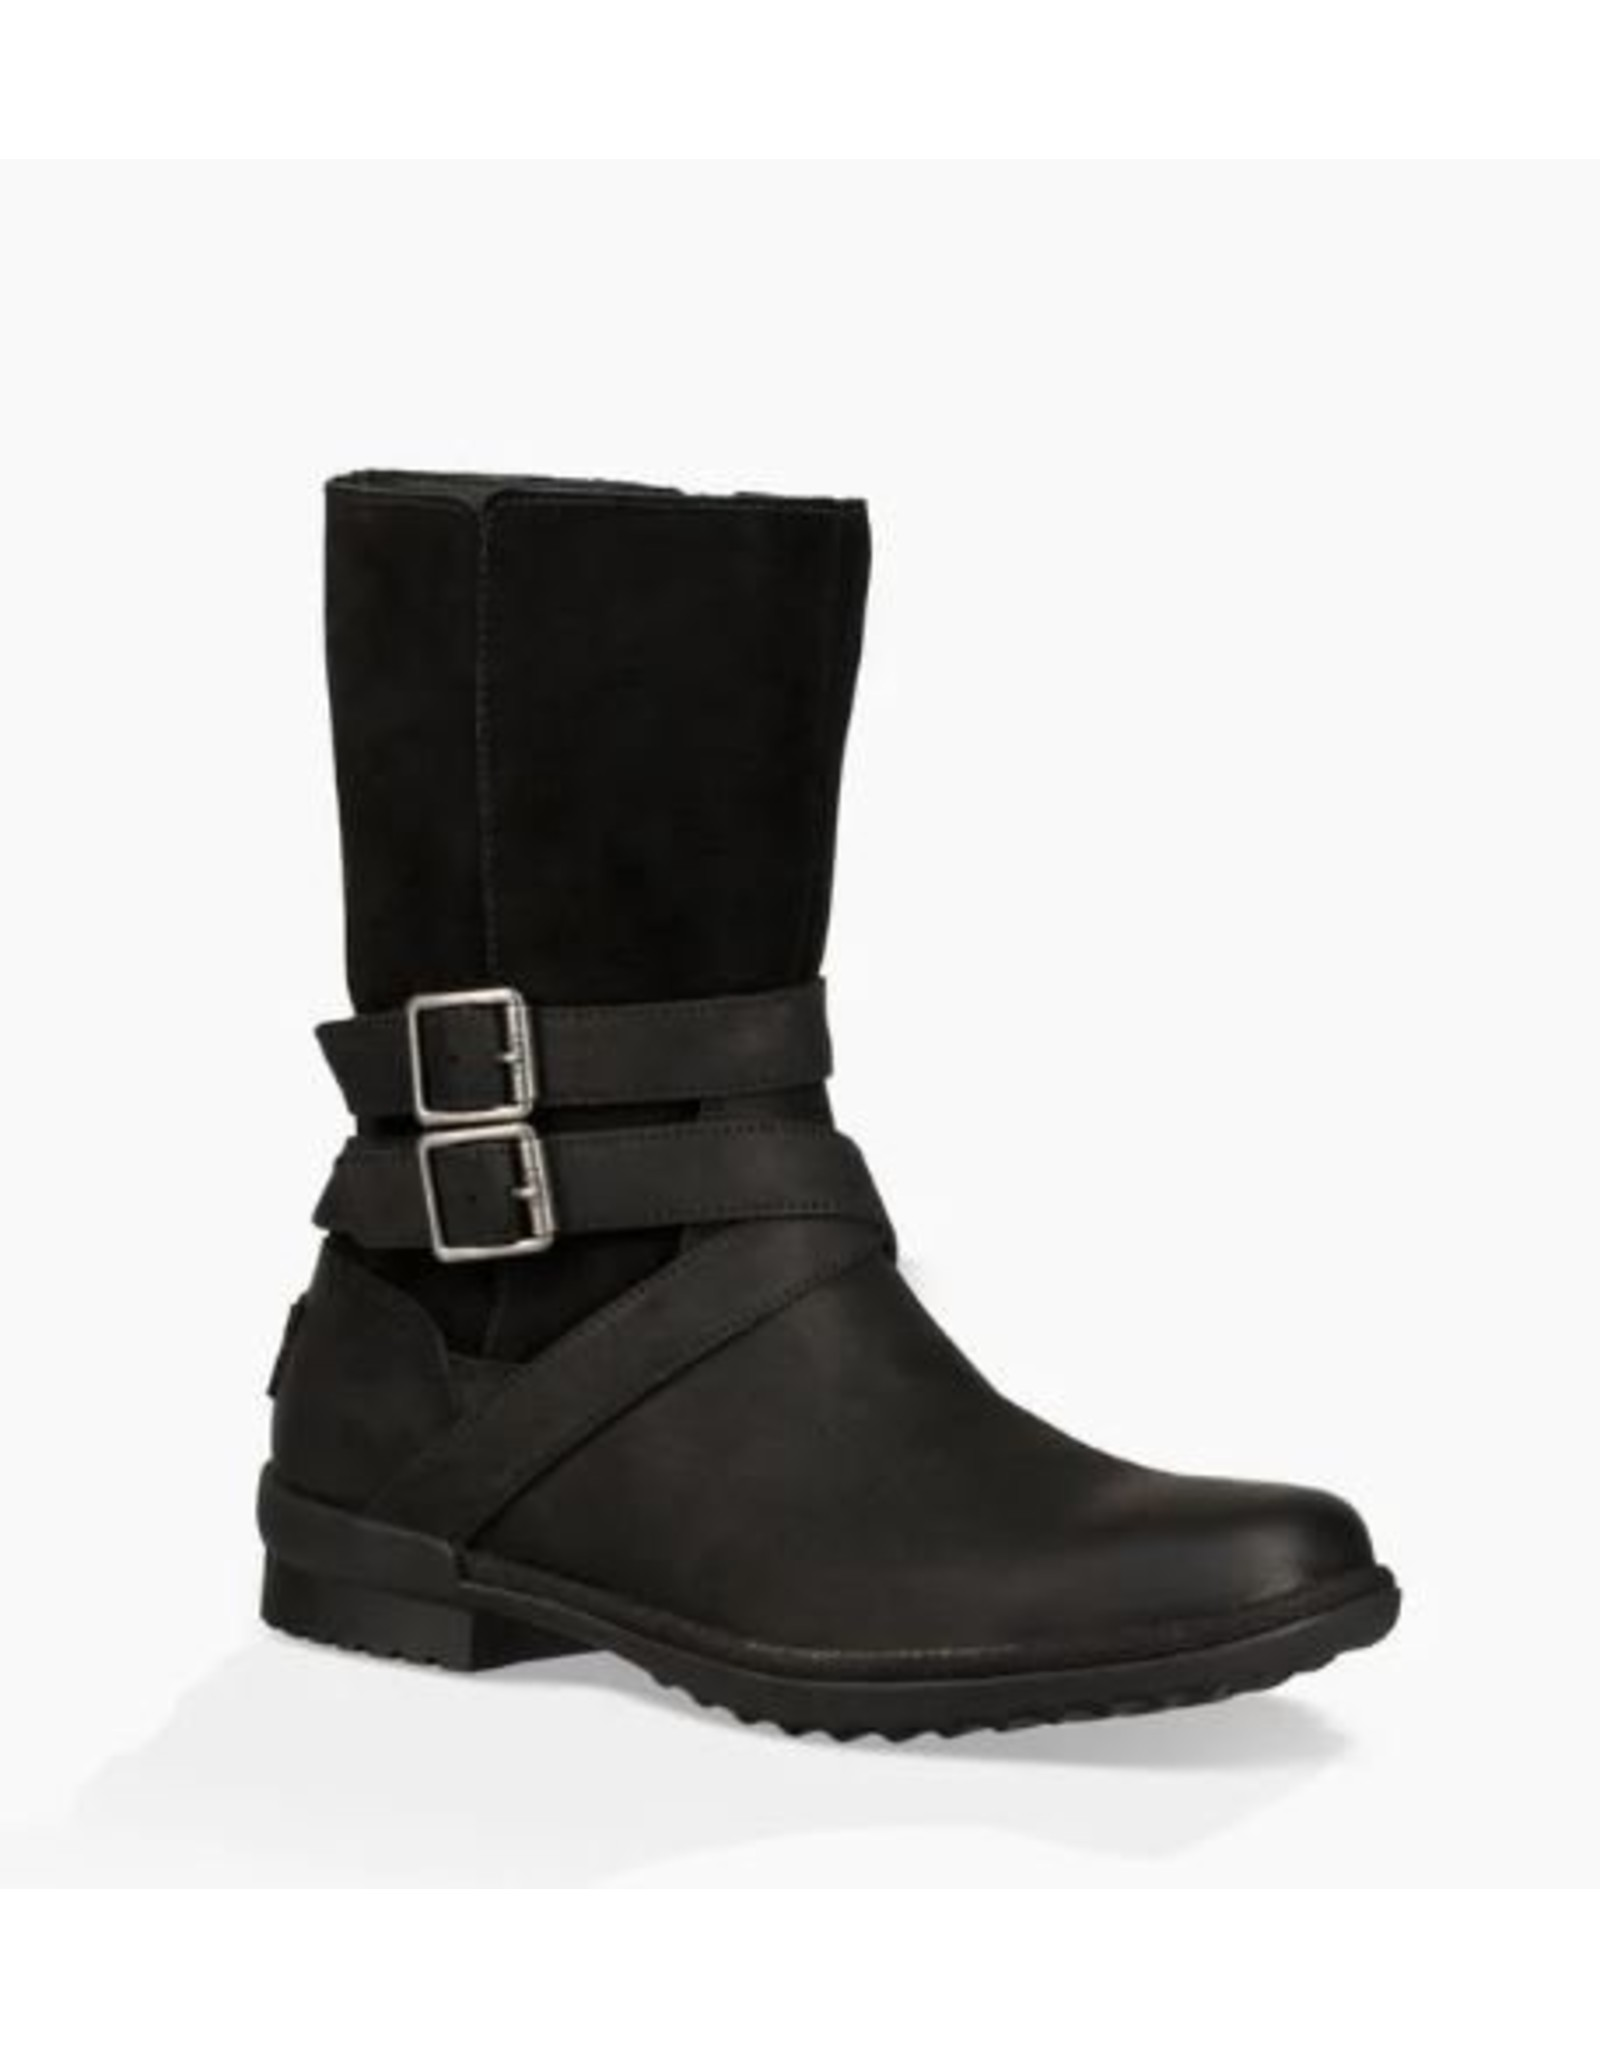 Uggs Women's Lorna Boot - 19af